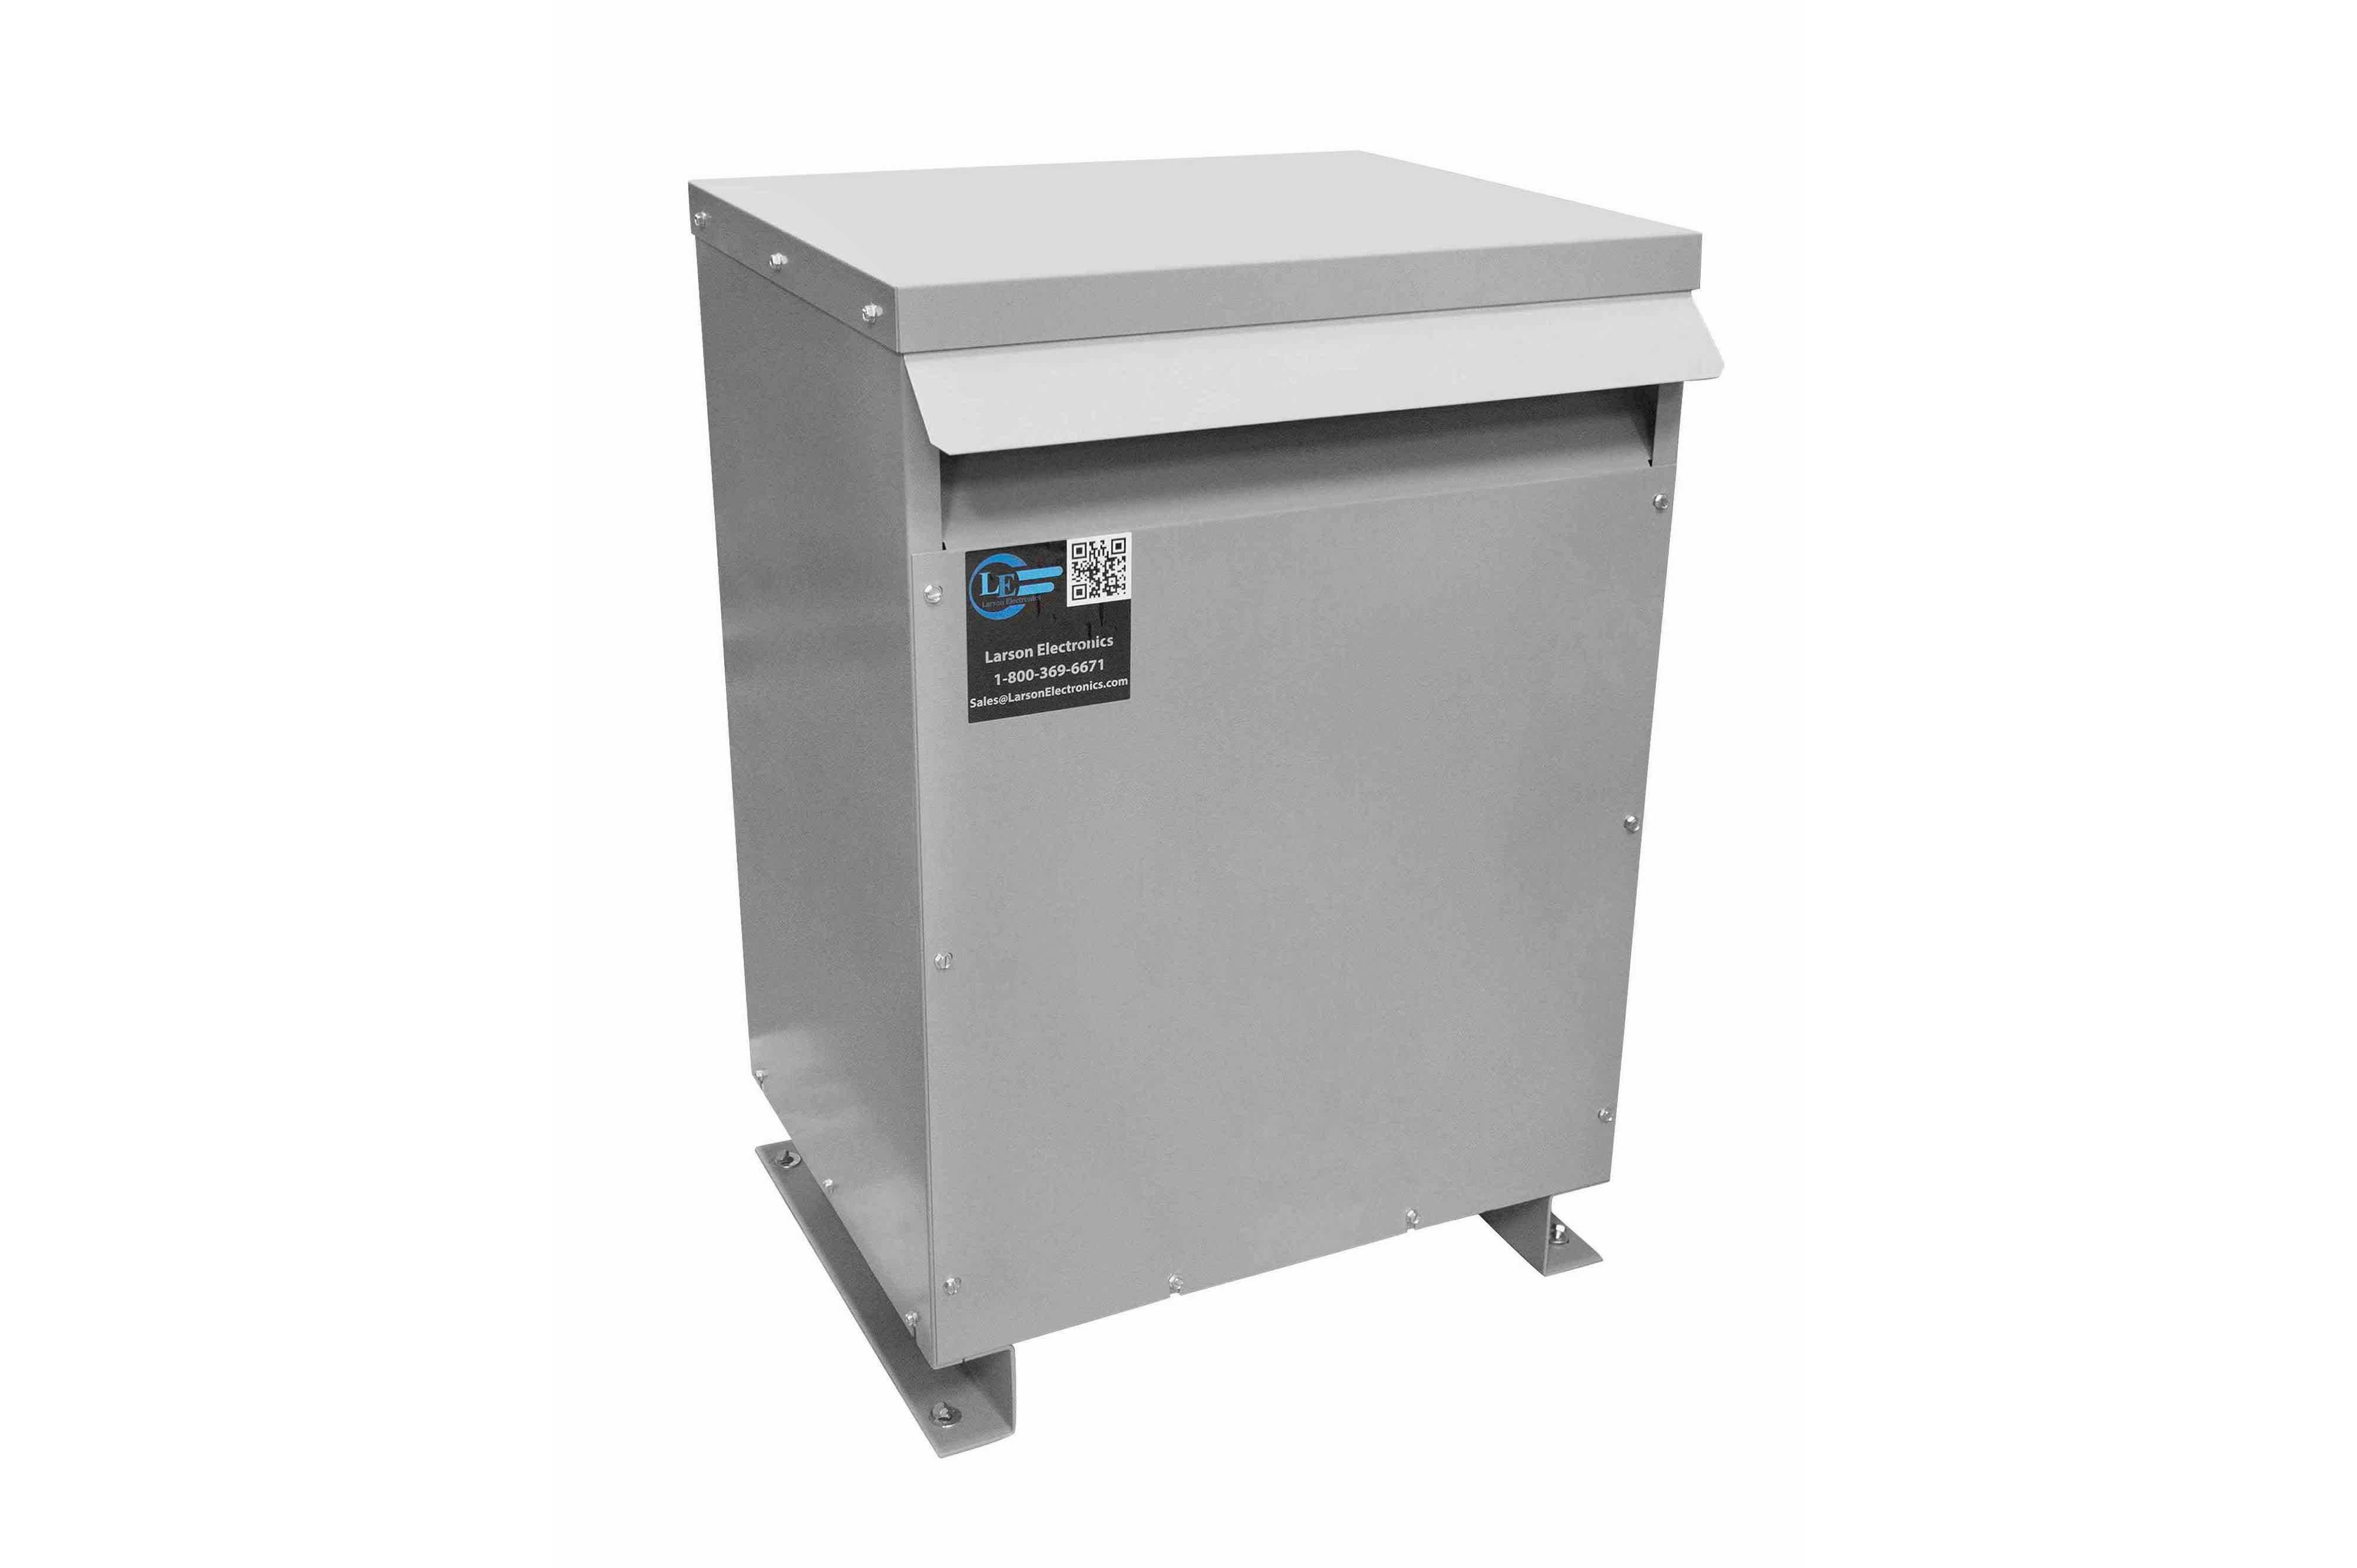 225 kVA 3PH DOE Transformer, 480V Delta Primary, 415Y/240 Wye-N Secondary, N3R, Ventilated, 60 Hz